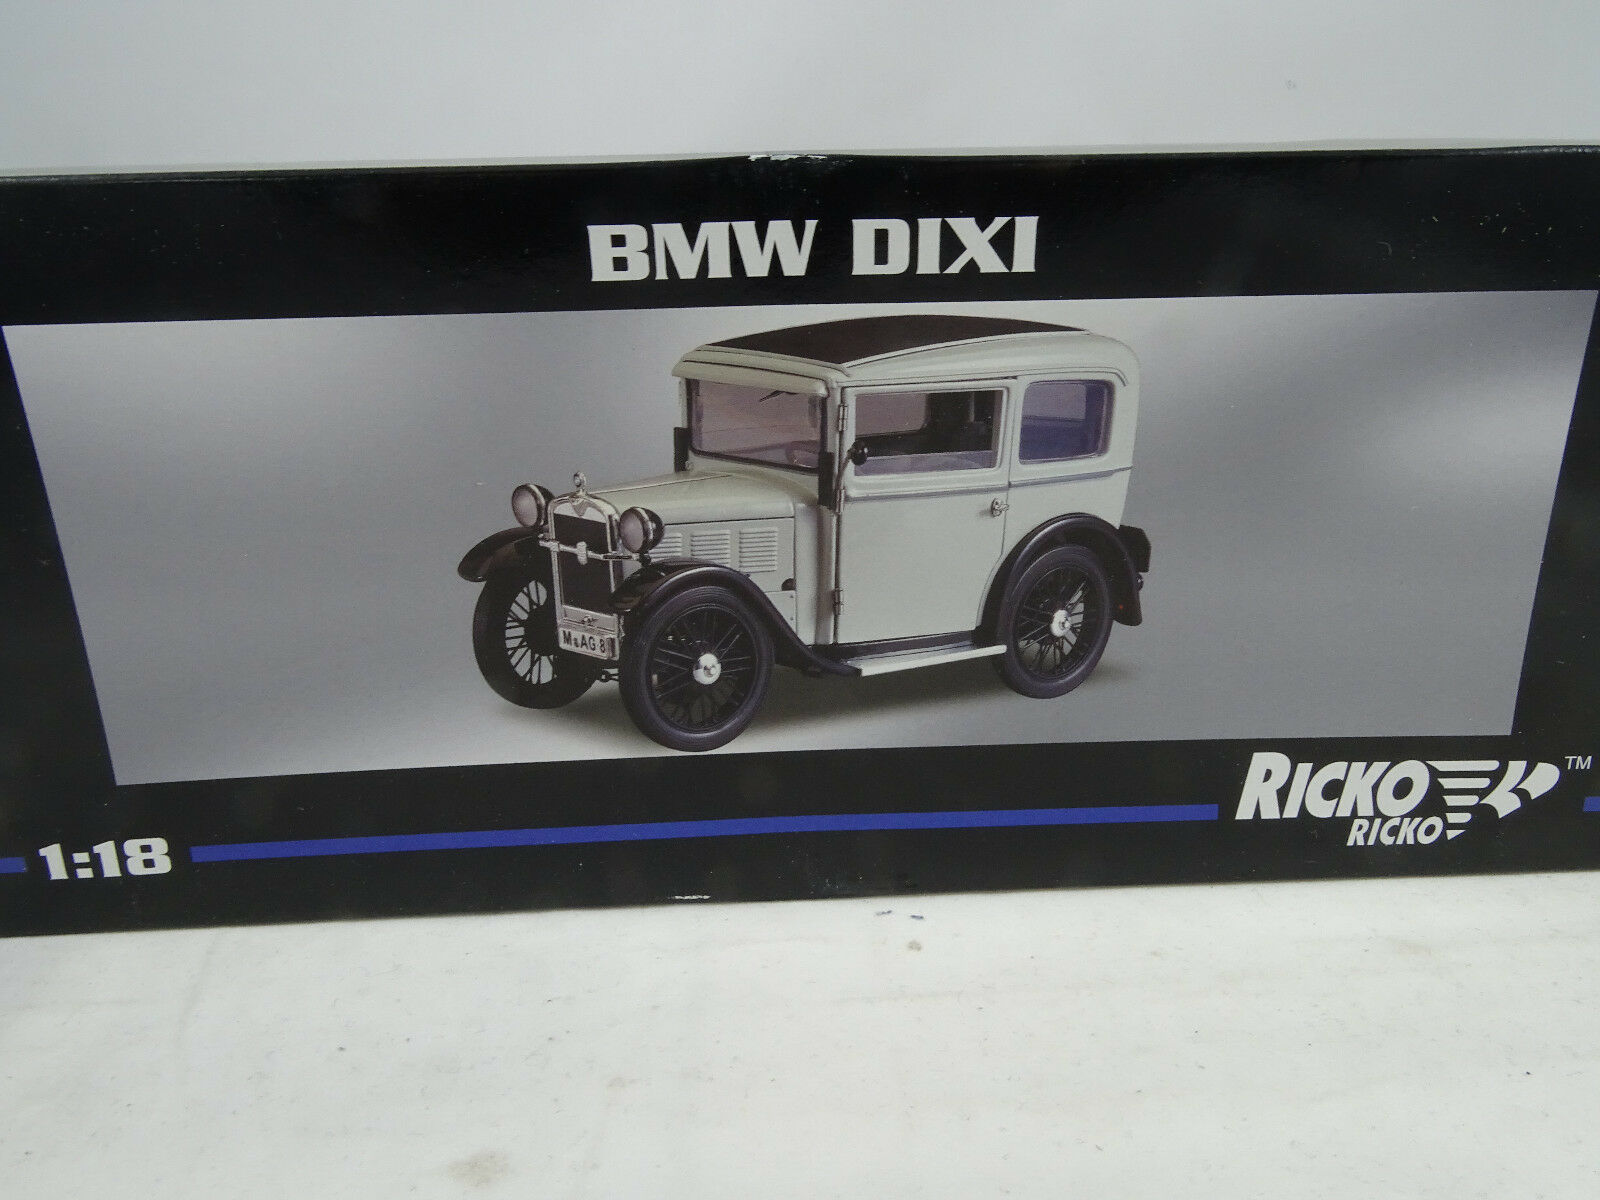 1:18 Ricko #32138 #32138 #32138 BMW Dixi Blancheur - Rare § aa1b99